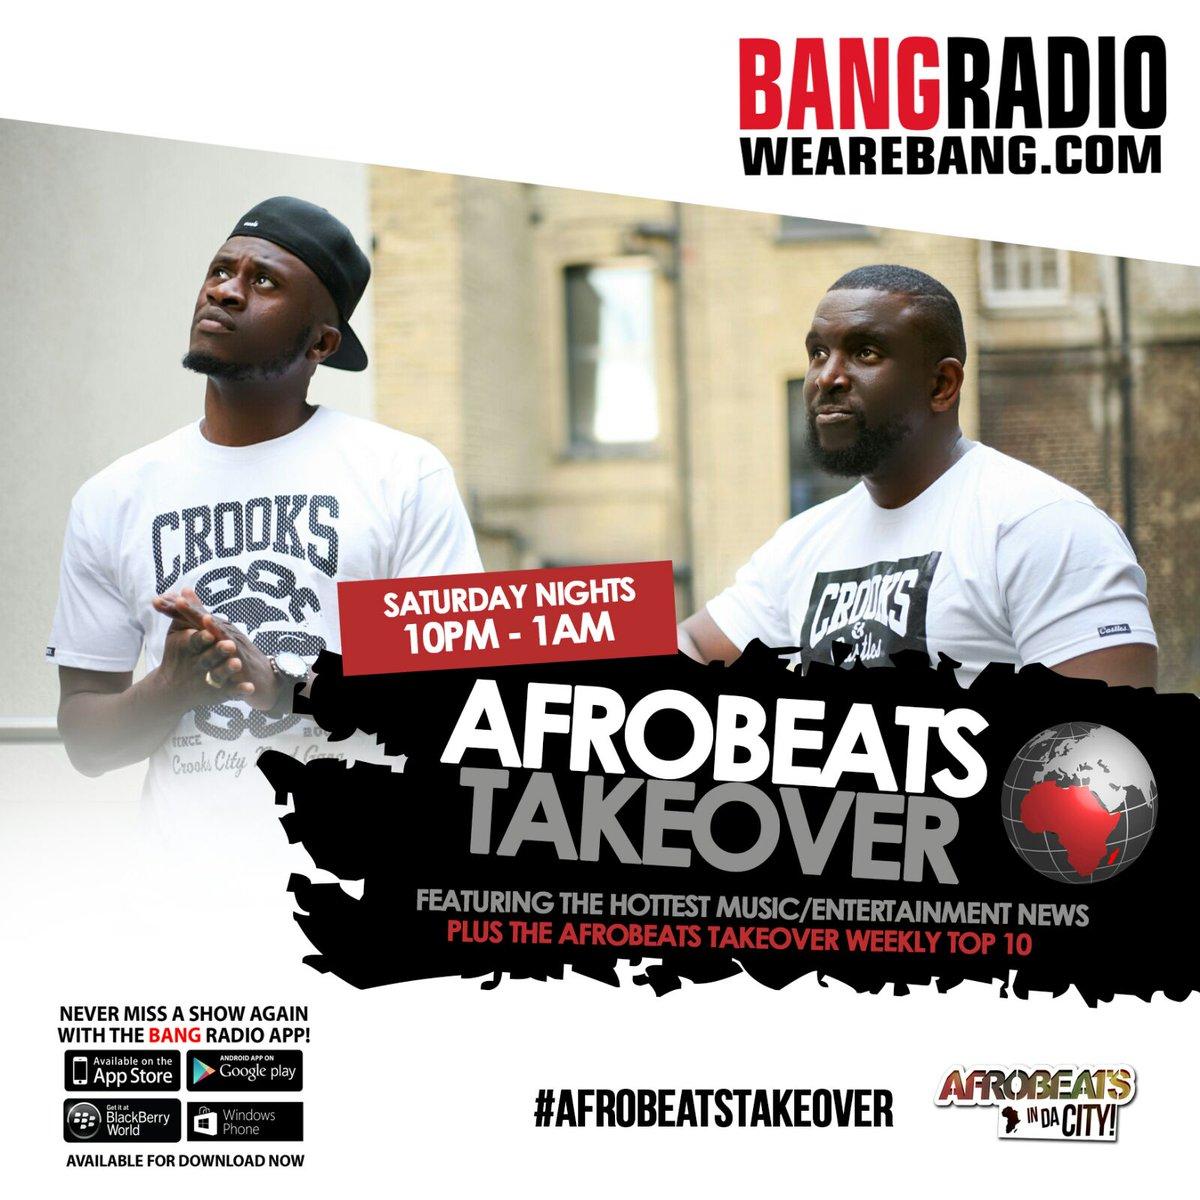 Looking forward to new show tonight on @WeAreBANGRADIO w/ @dboyCityLove and Selector Maestro #AfrobeatsTakeover https://t.co/S4eonauWnZ